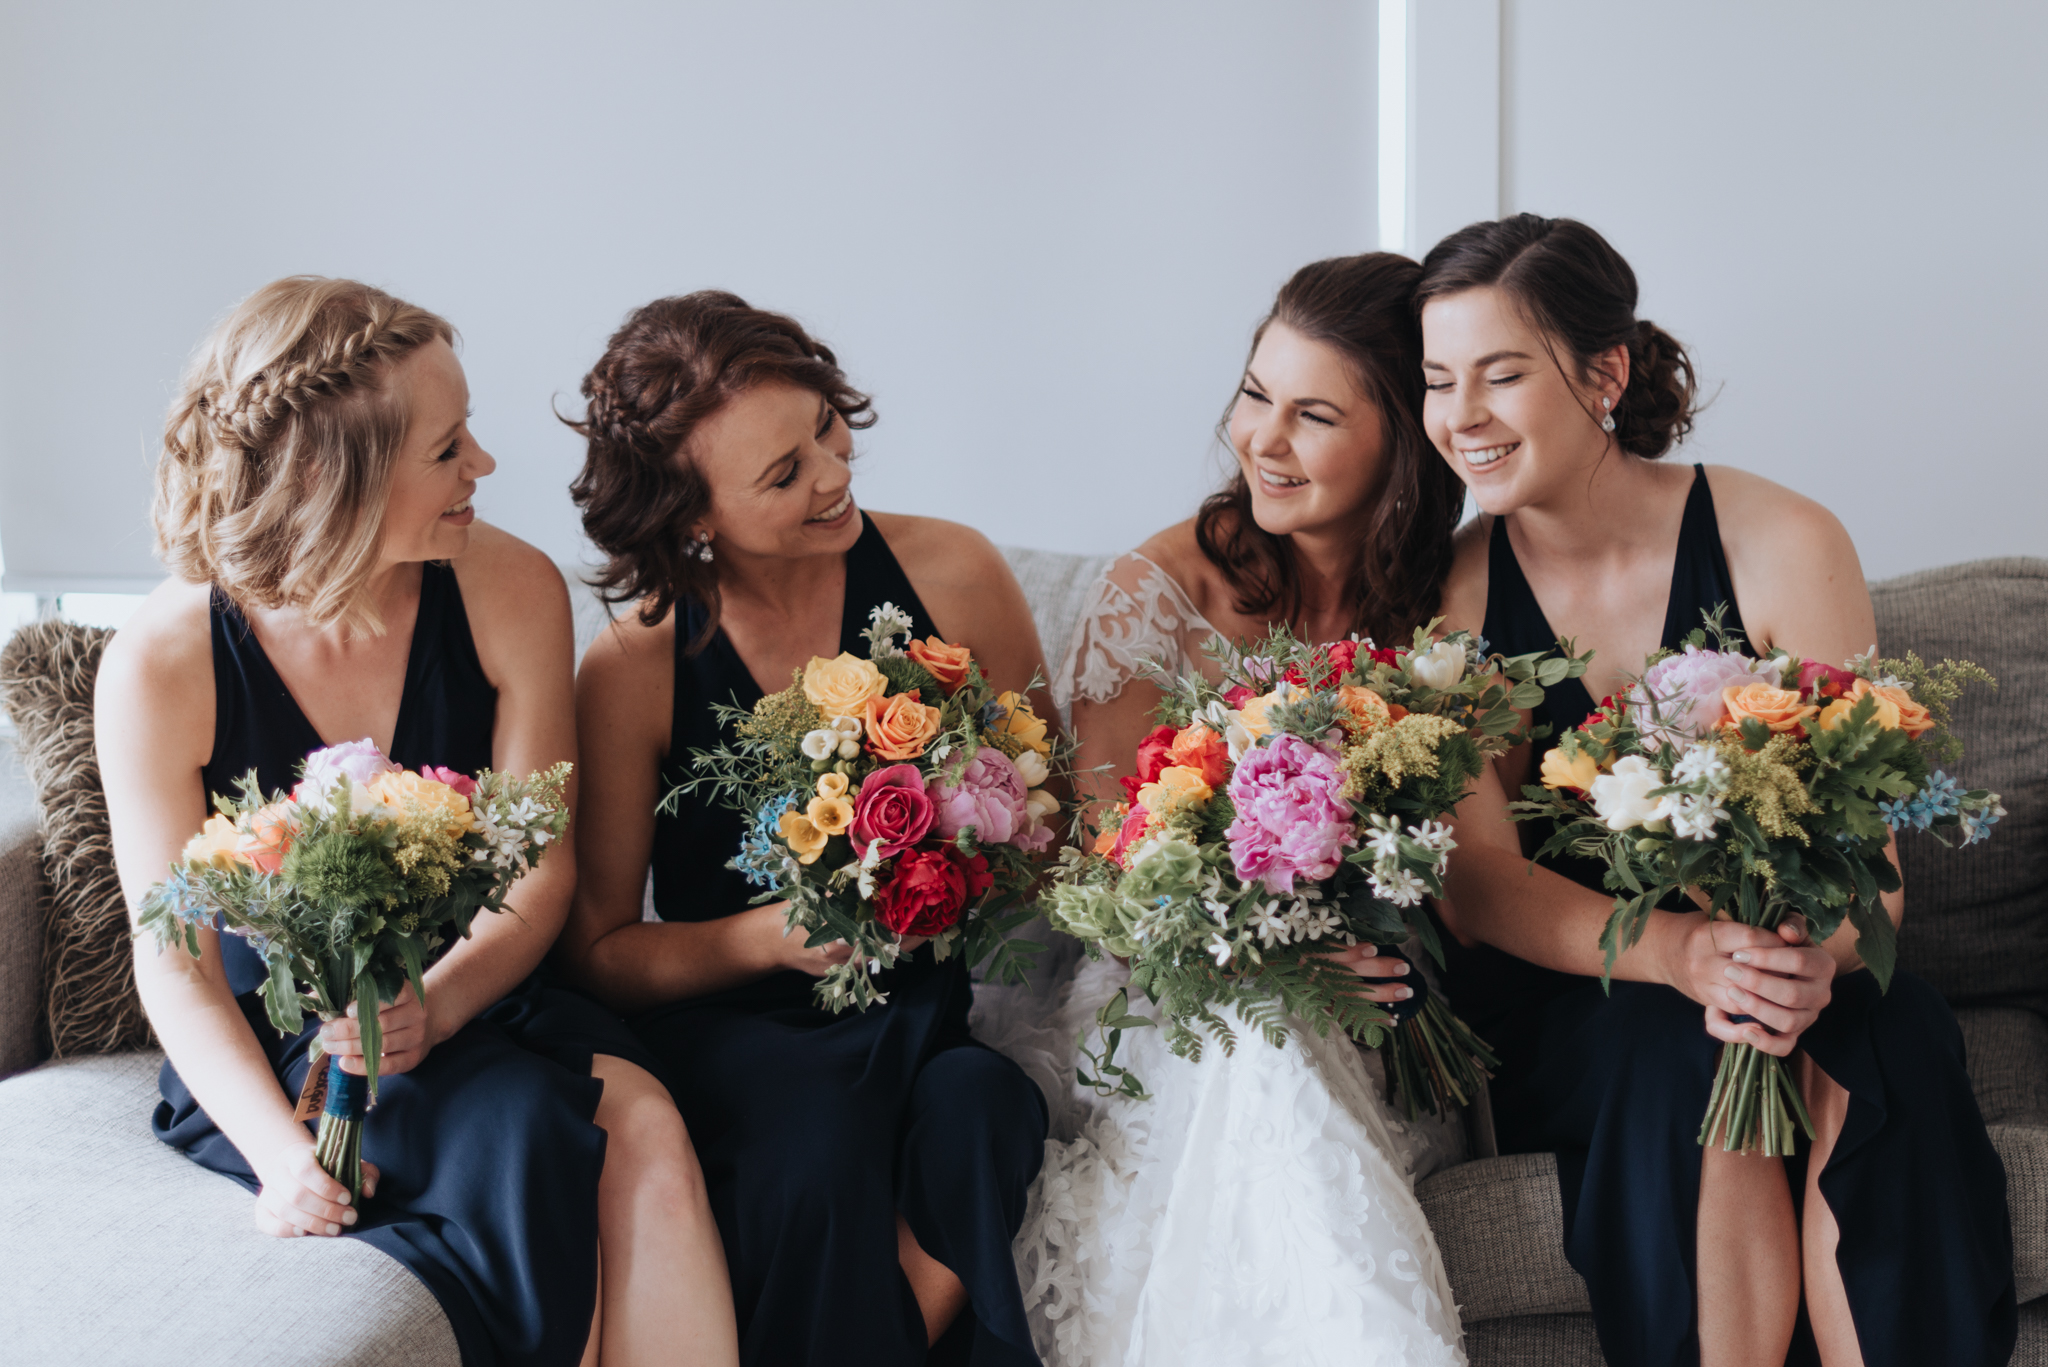 LOVELENSCAPES PHOTOGRAPHY • VISUAL POETRY • NEW ZEALAND WEDDING PHOTOGRAPHER • AUSTRALIAN WEDDING PHOTOGRAPHER • BRISBANE • MELBOURNE • SYDNEY • HOBART • TARUREKA ESTATE • ANNA CAMPBELL • 64.jpg